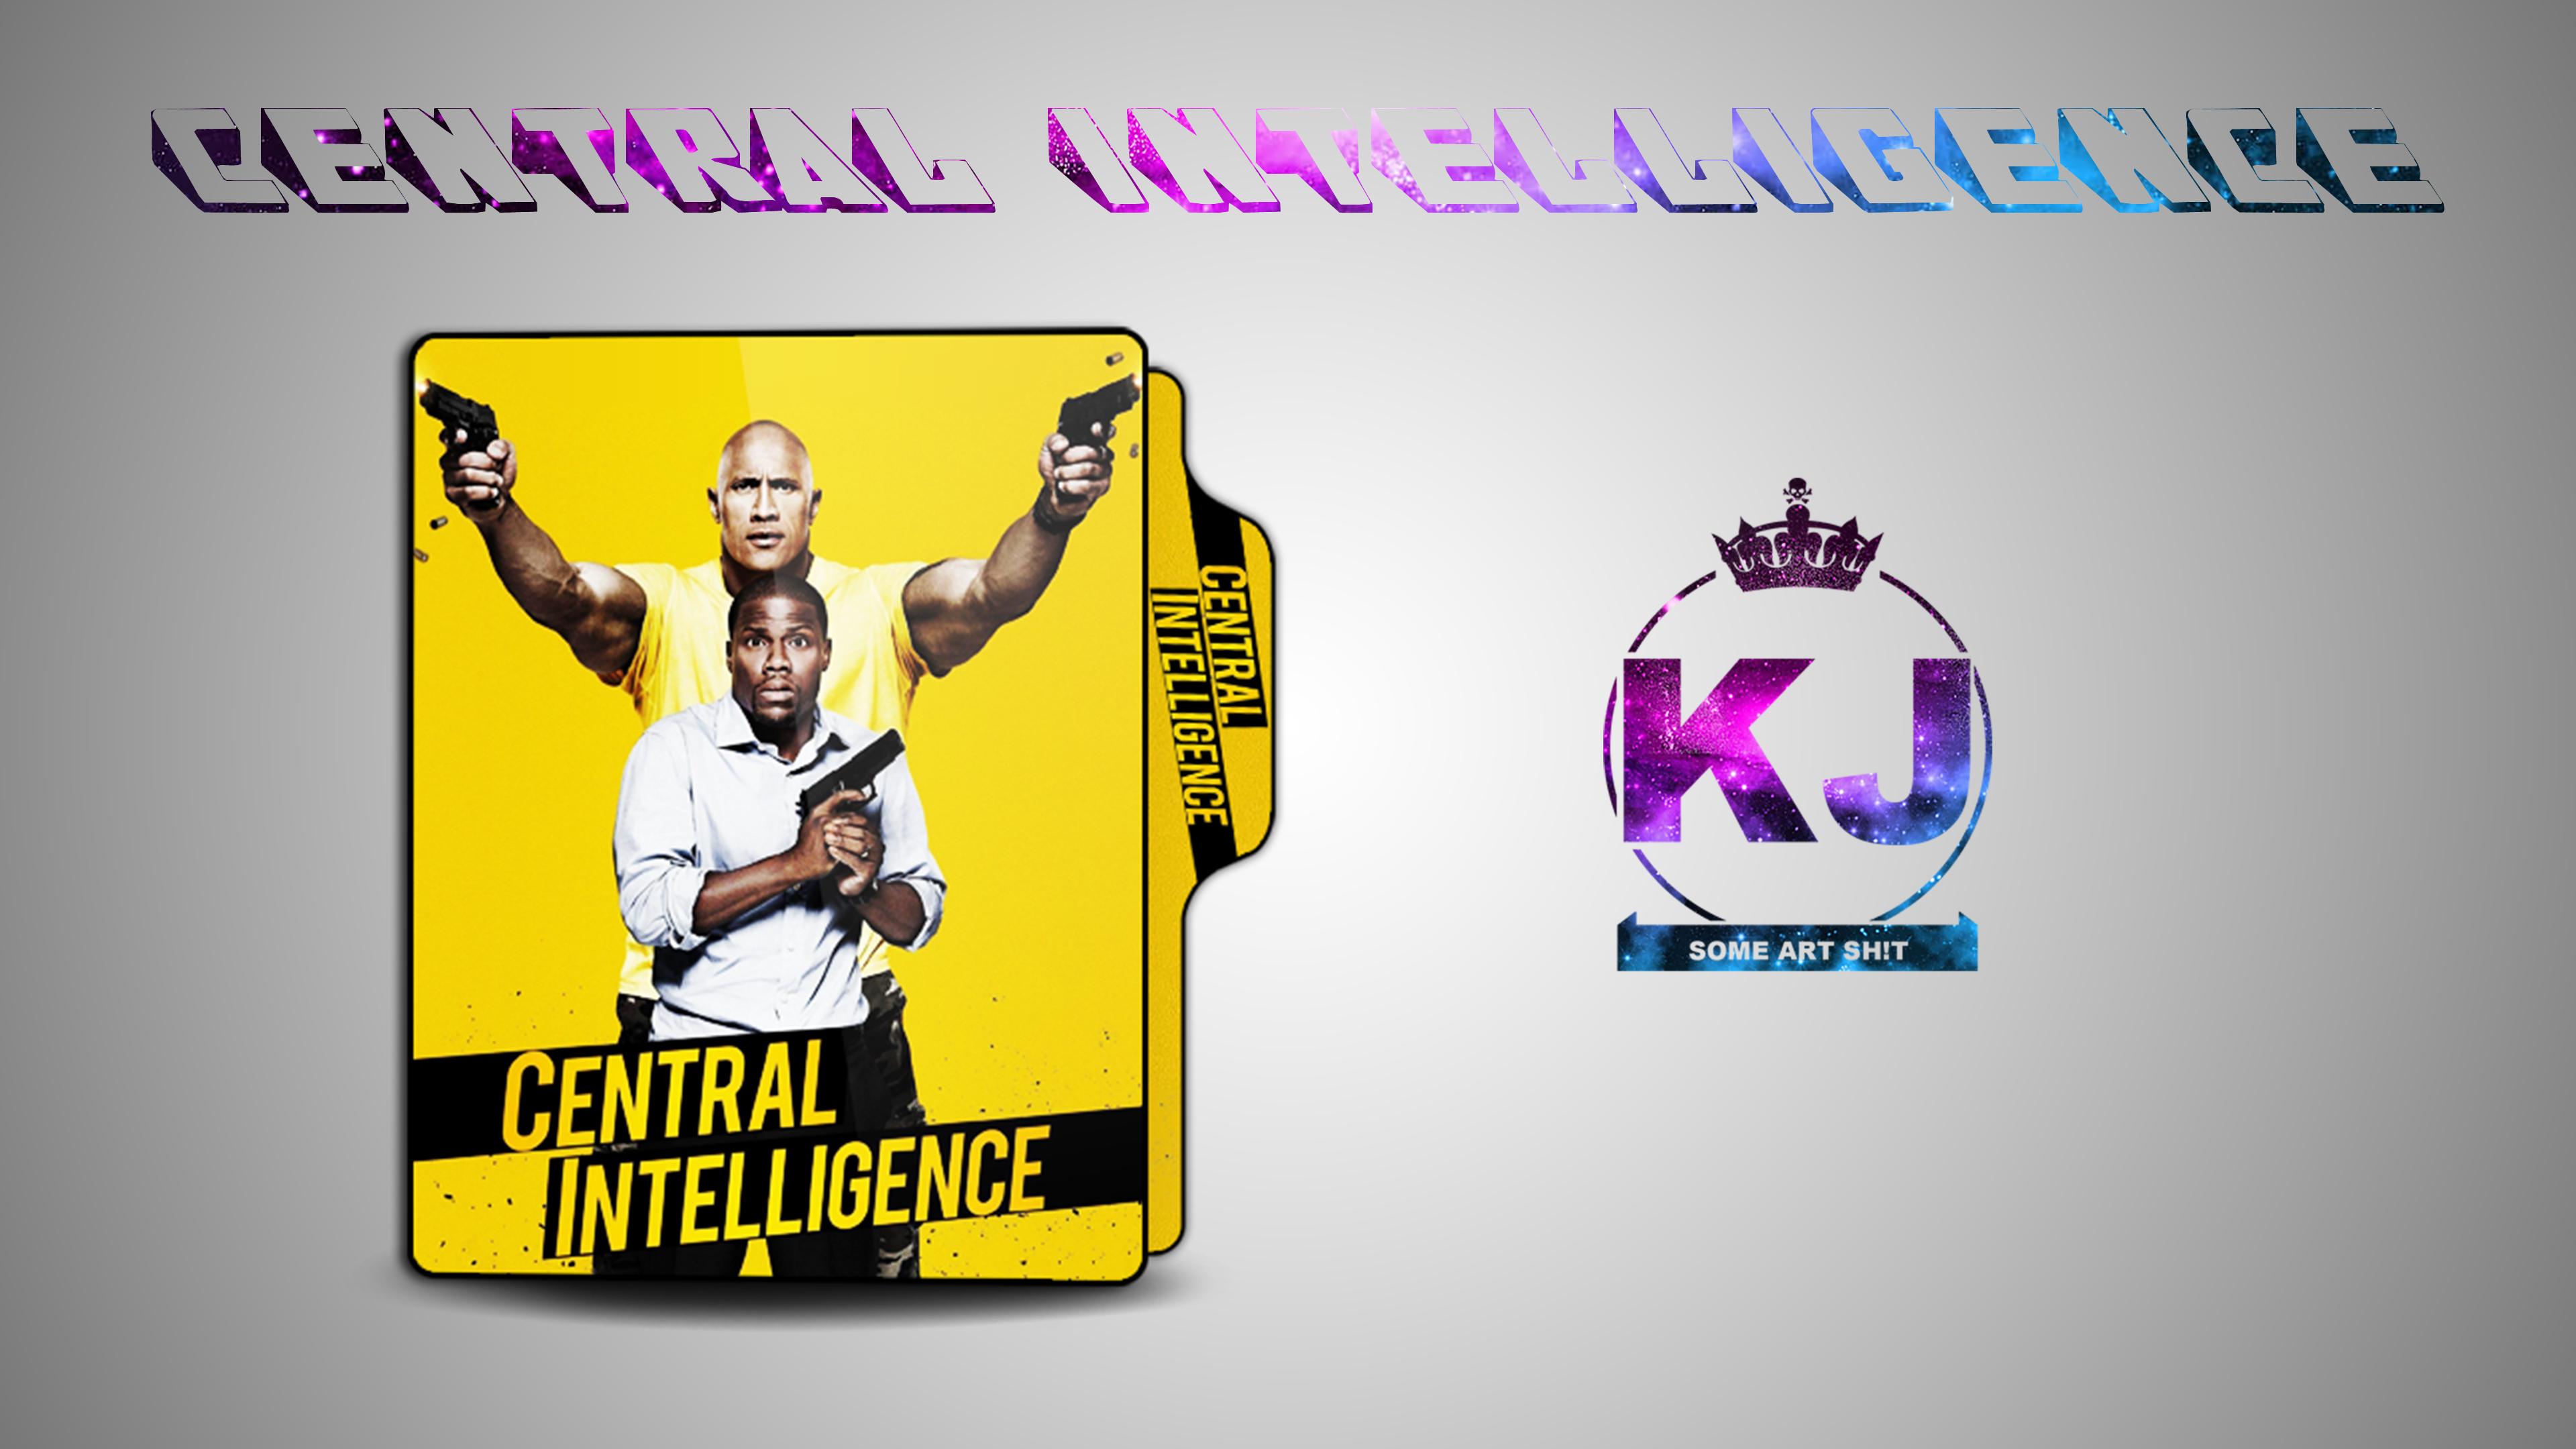 Central Intelligence 2016 Folder Icon By Kingjoe93 On Deviantart